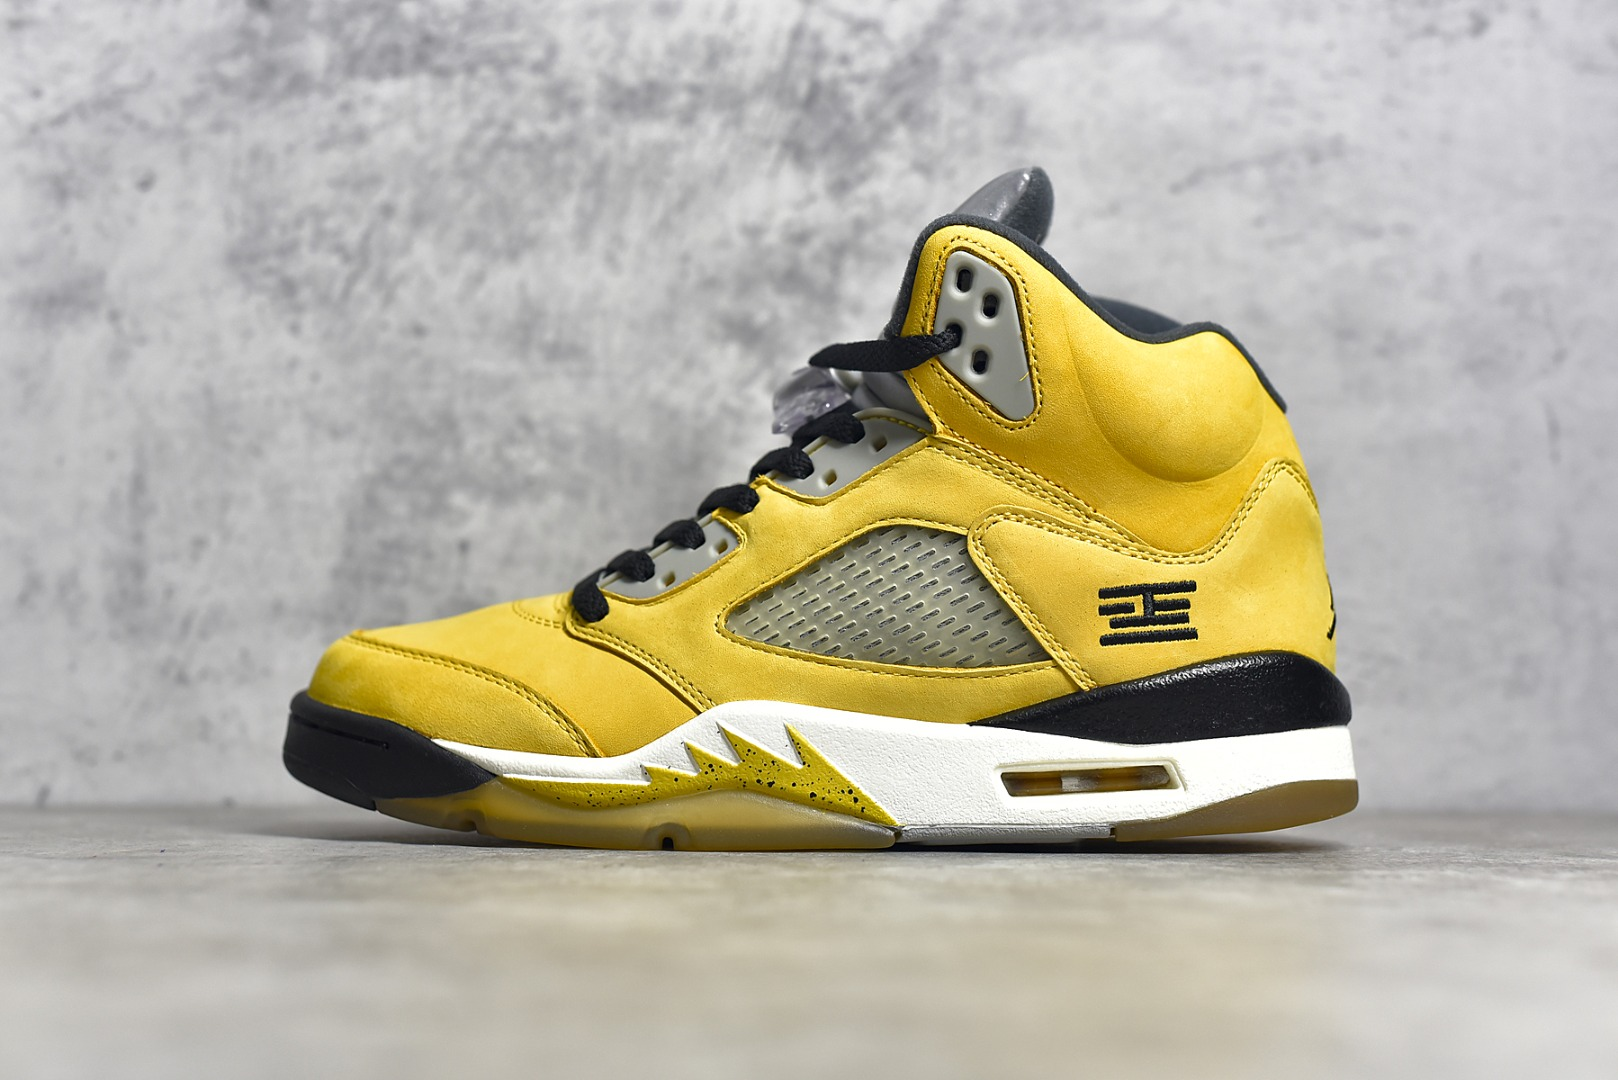 AJ5东京黄色实战球鞋 Air Jordan 5 Retro Tokyo T23东京 AJ5黄色篮球鞋 货号:454783-701-潮流者之家